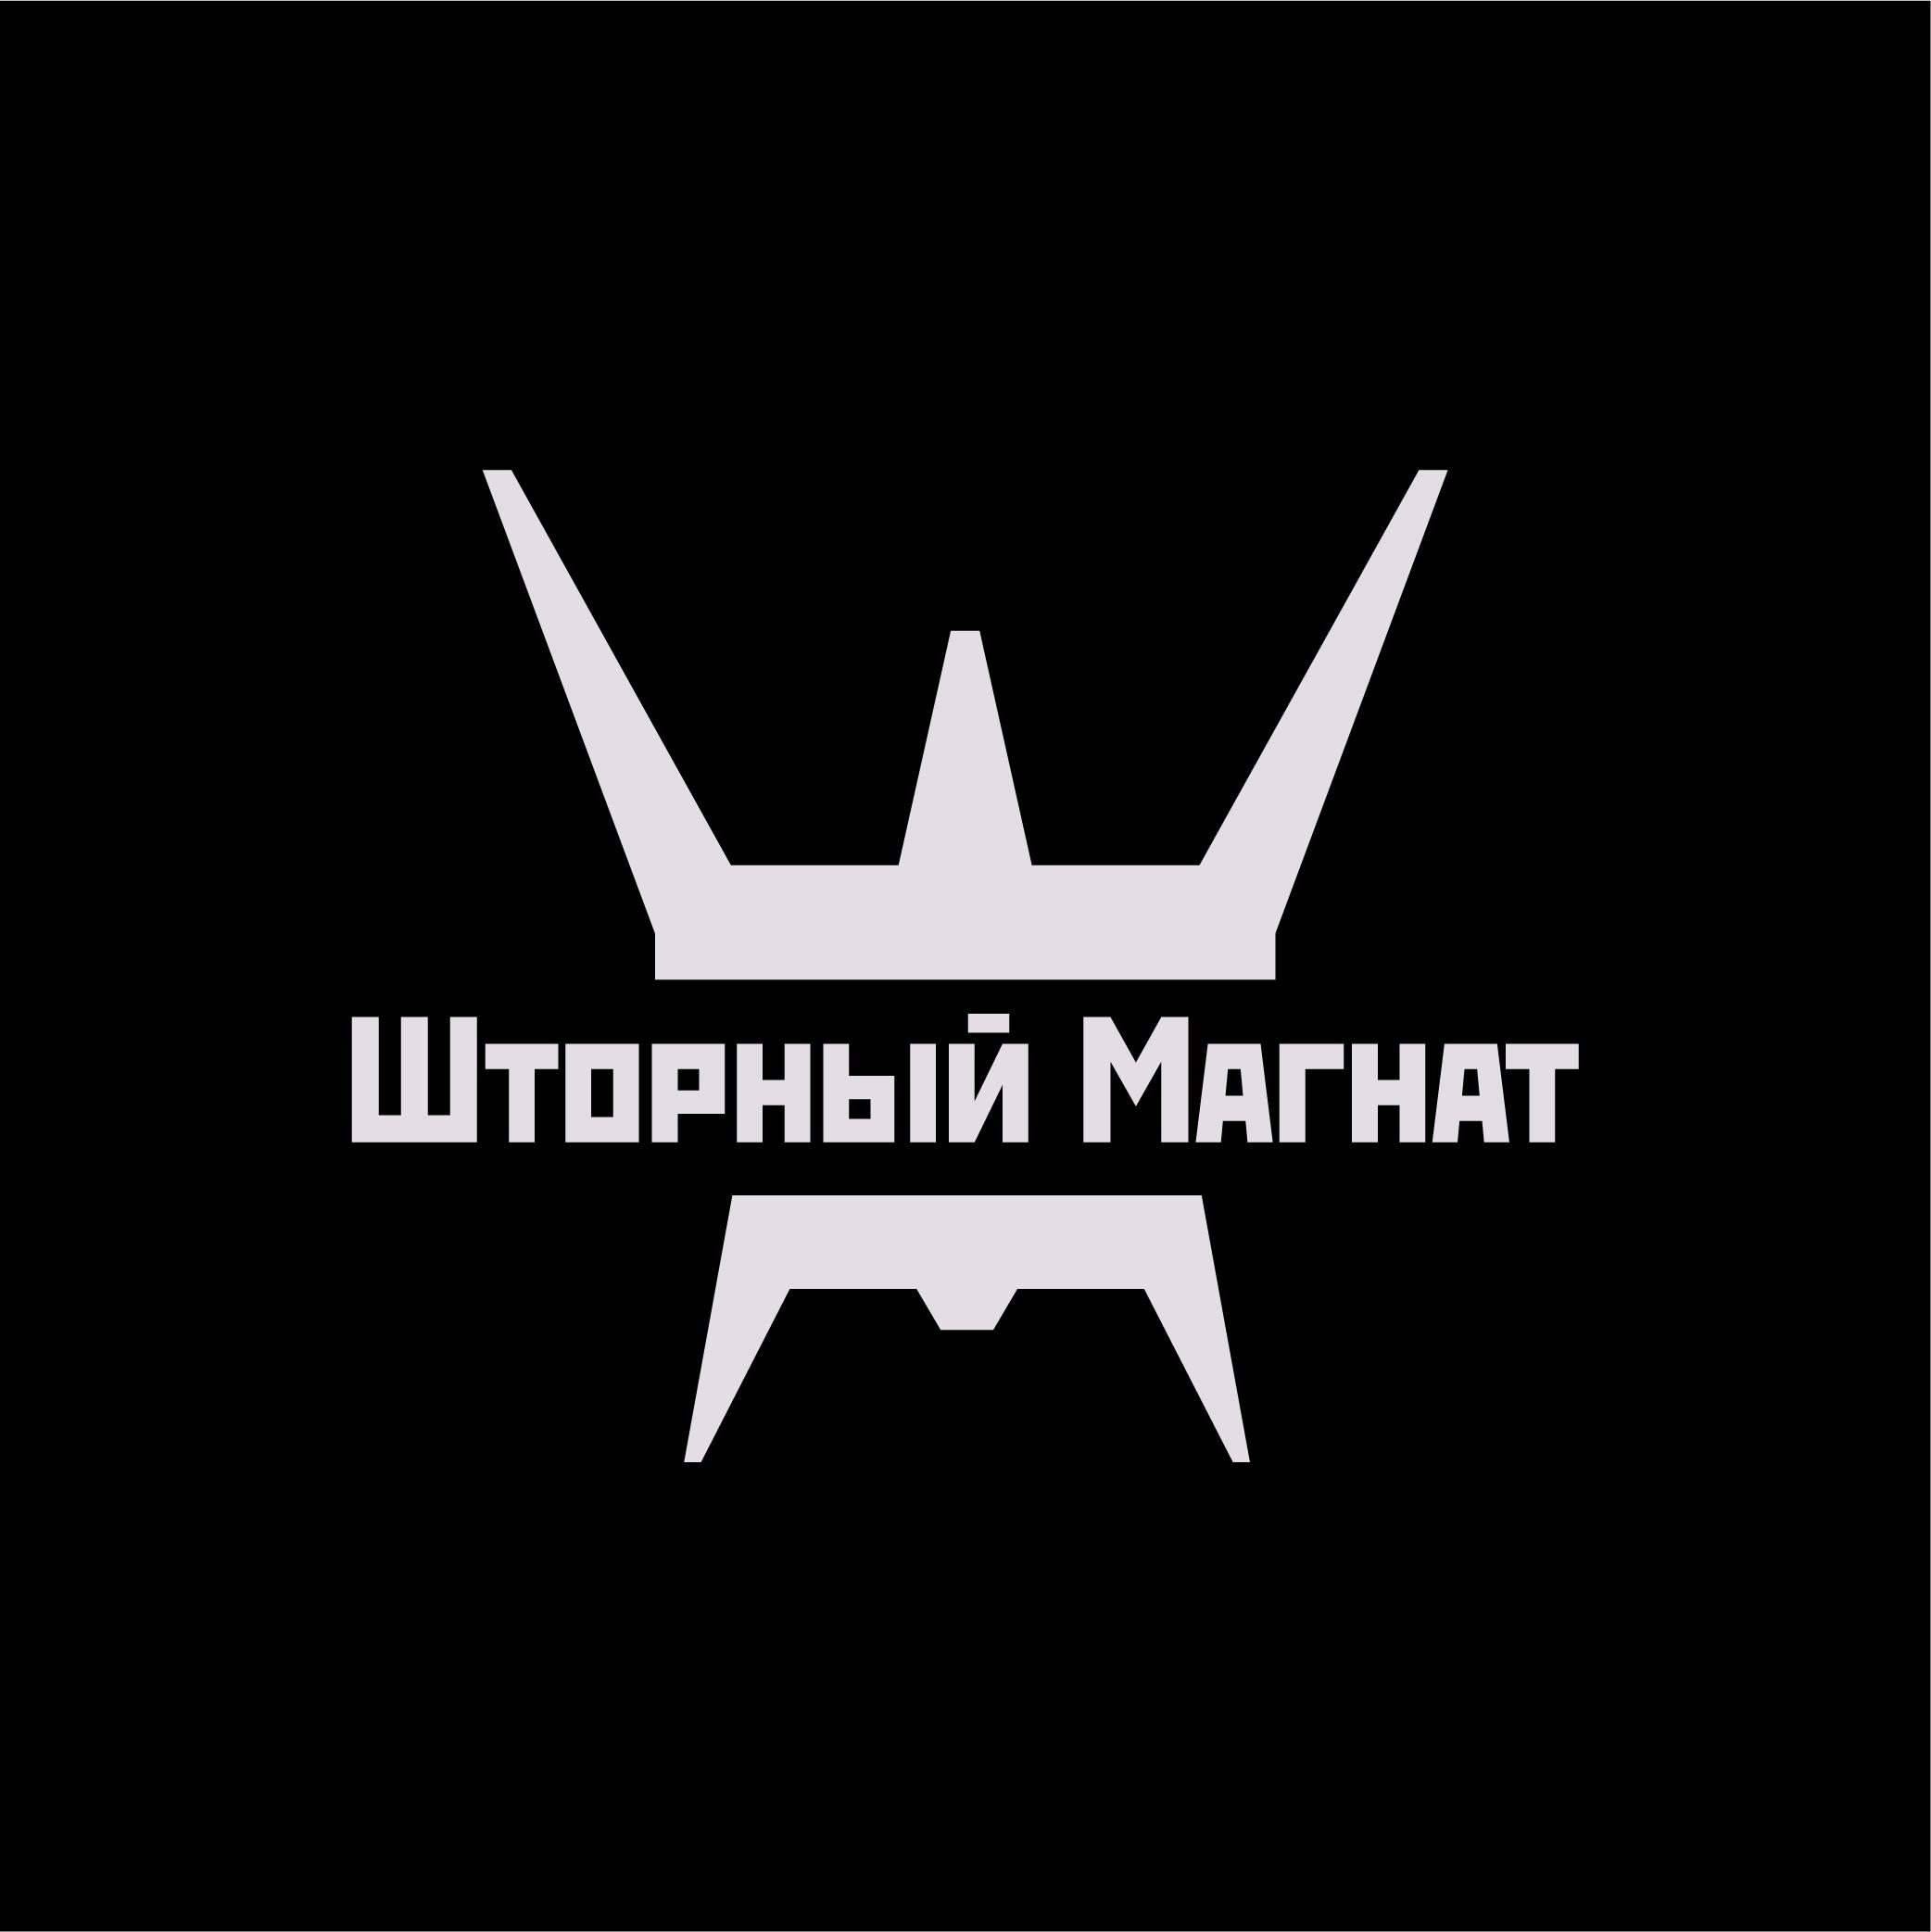 Логотип и фирменный стиль для магазина тканей. фото f_0025cd920fcd5b93.jpg